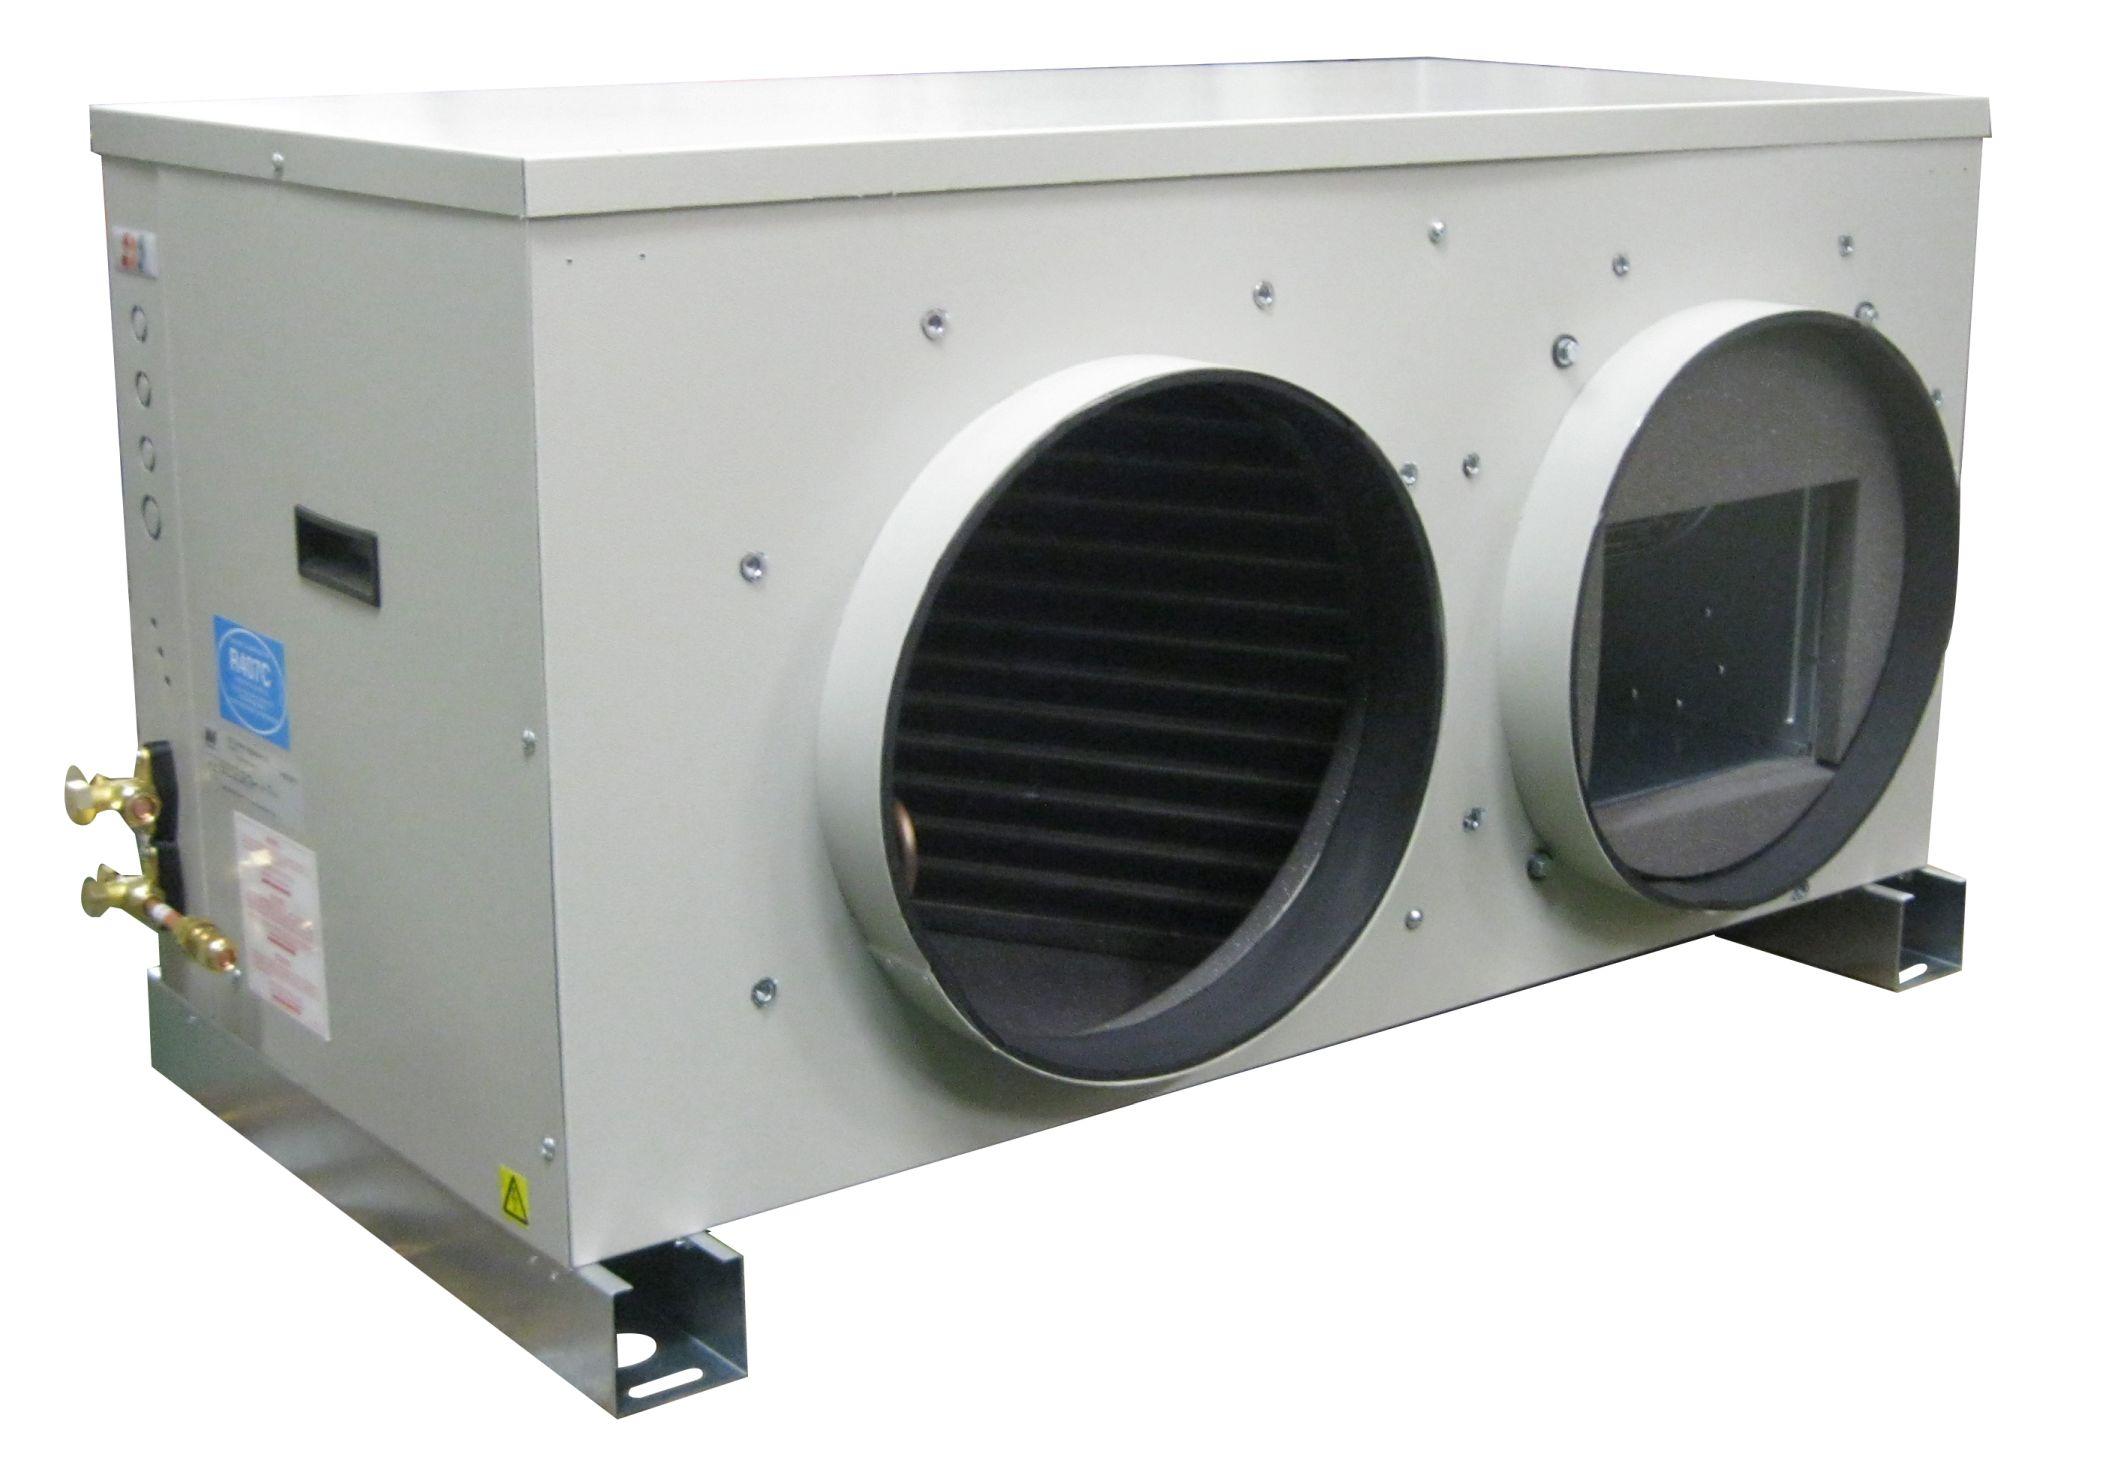 ducted condensing unit #3F648C